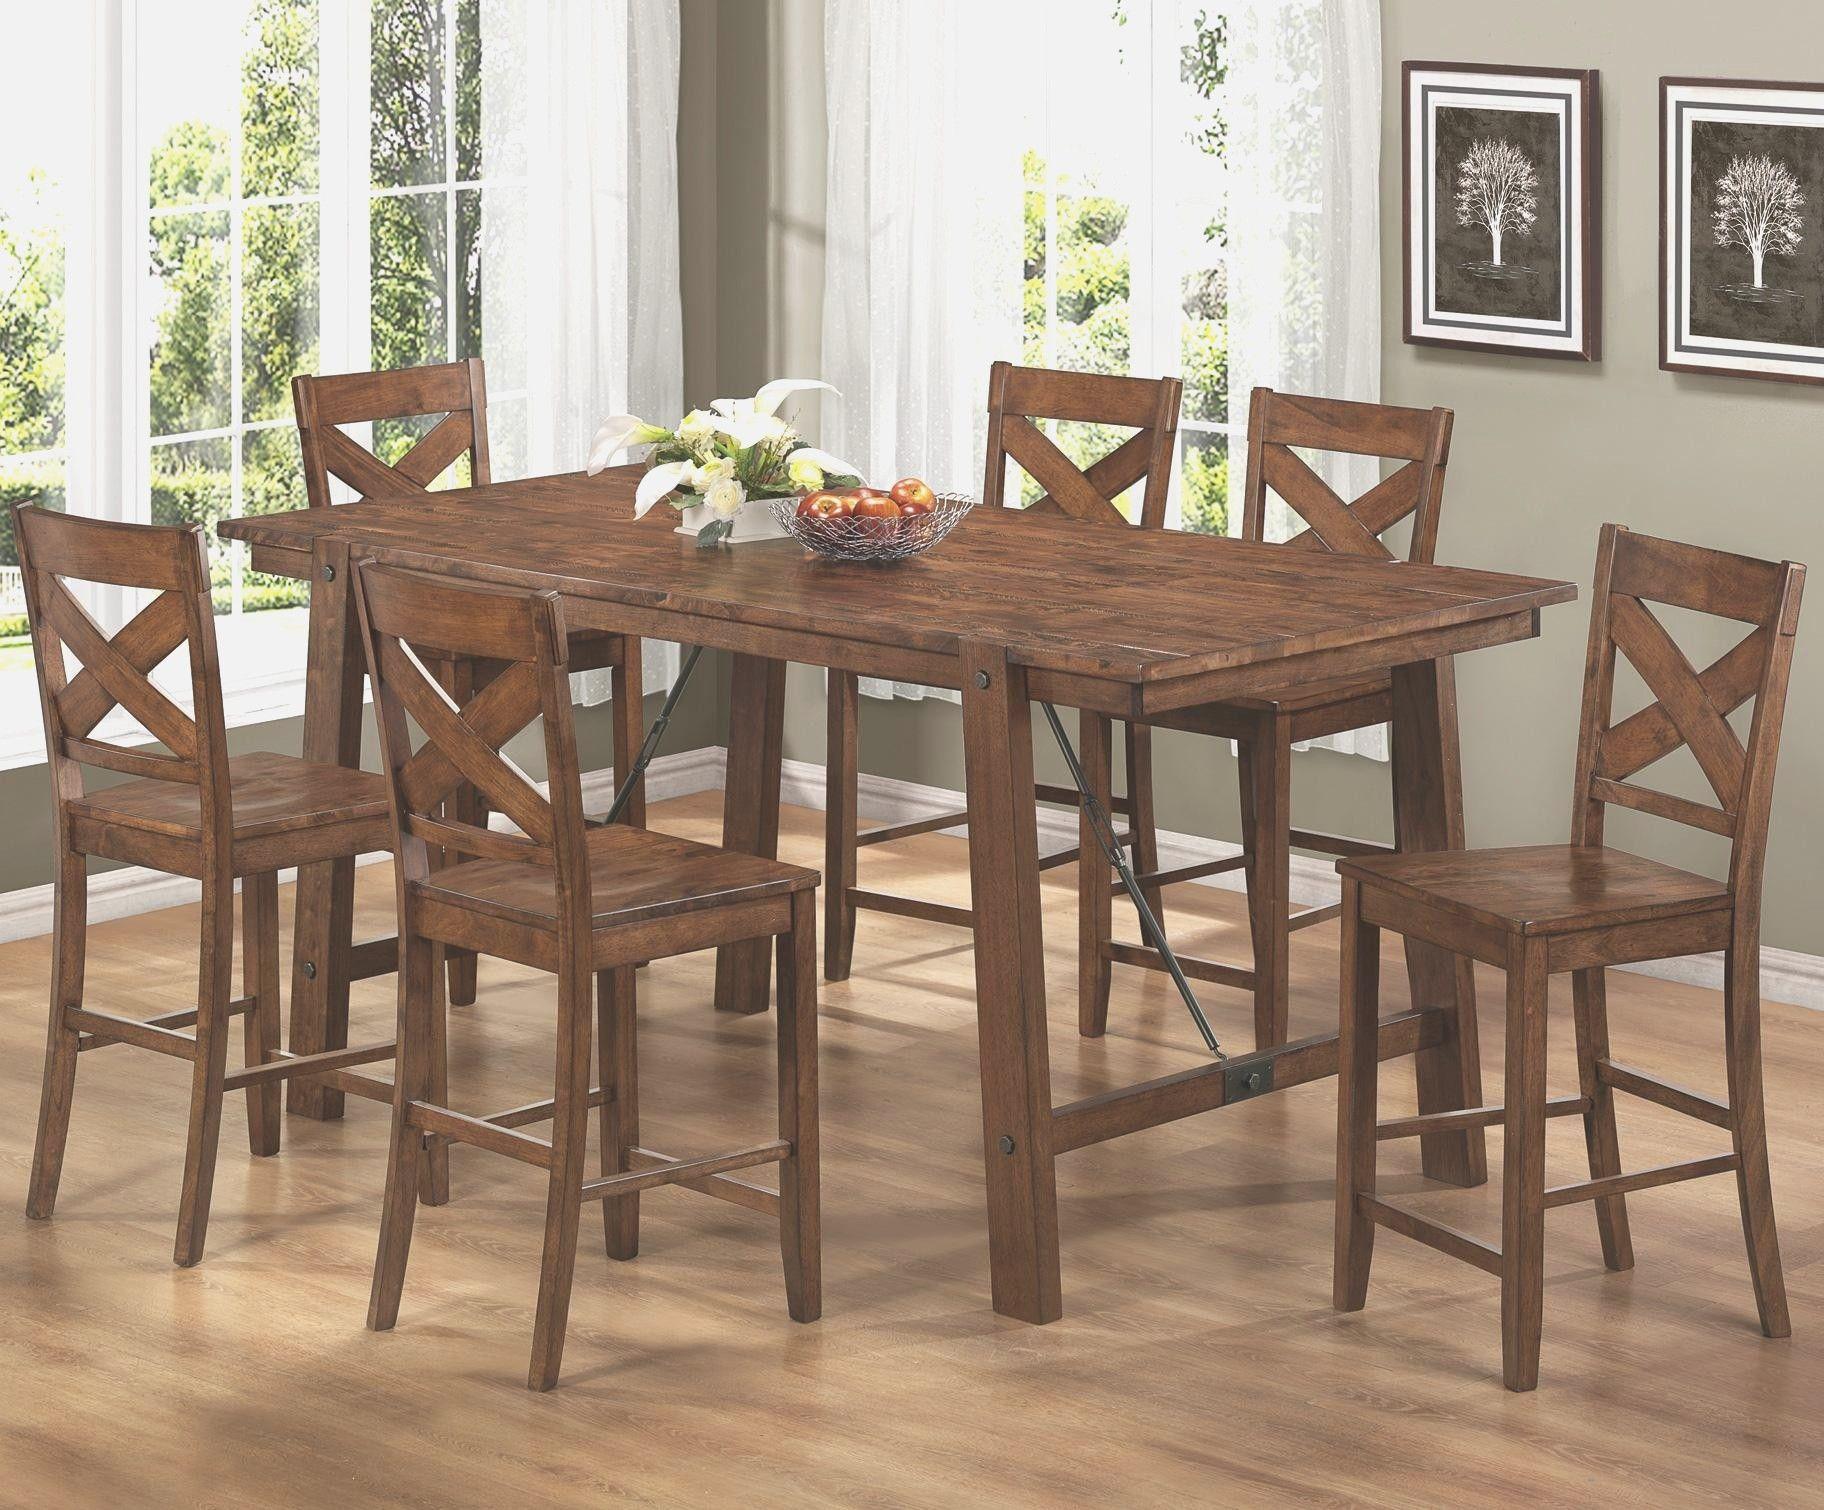 Standard Banquet Chairs Animal Print High Chair Chiavari Vs Cover Size Covers